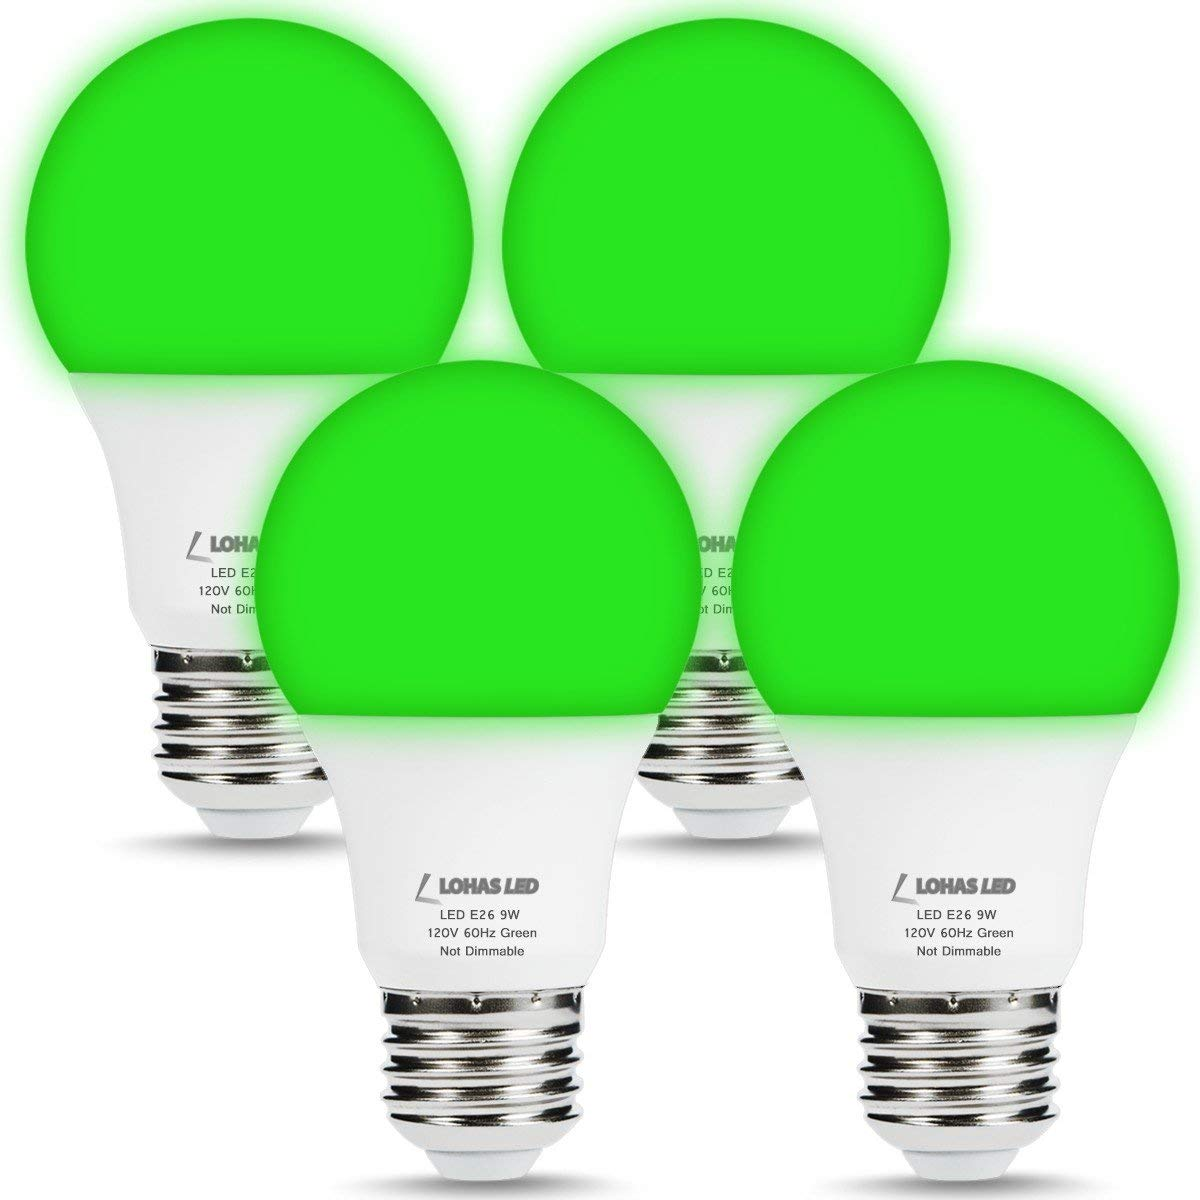 LOHAS Green Light Bulb, 60Watt Light Bulb Equivalent, A19 LED Bulb (9W), E26 Base LED, 810LM, 240 Degree Beam Angle, Non Dimmable for Decorative Lighting, 4 Pack